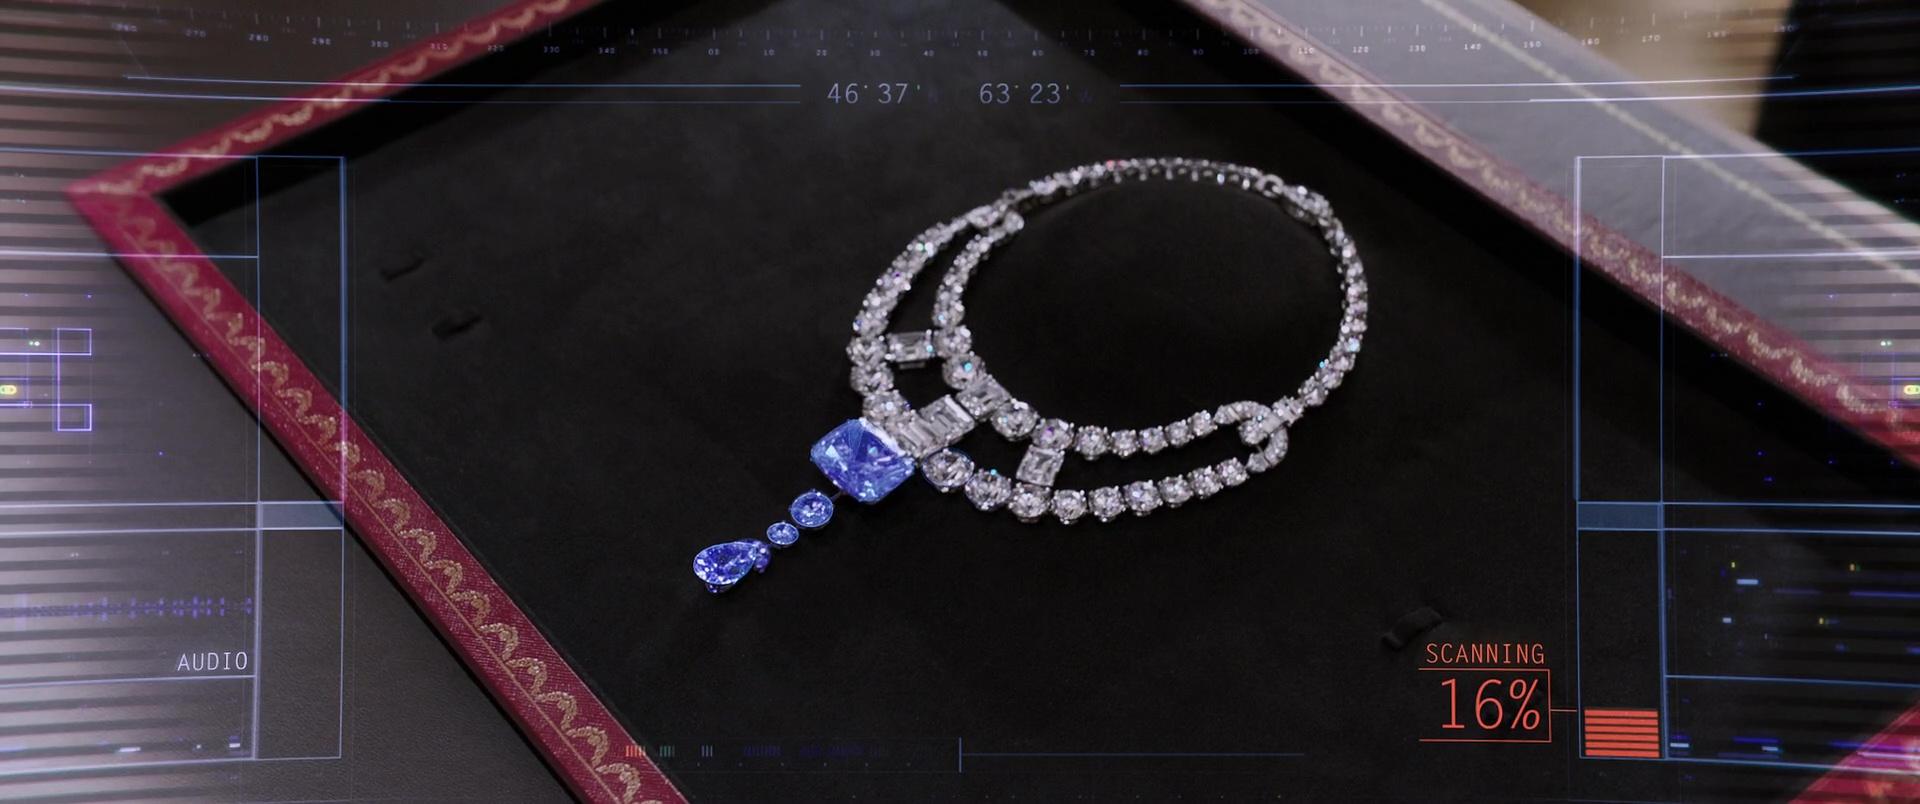 Cartier Toussaint Necklace In Ocean S 8 2018 Movie